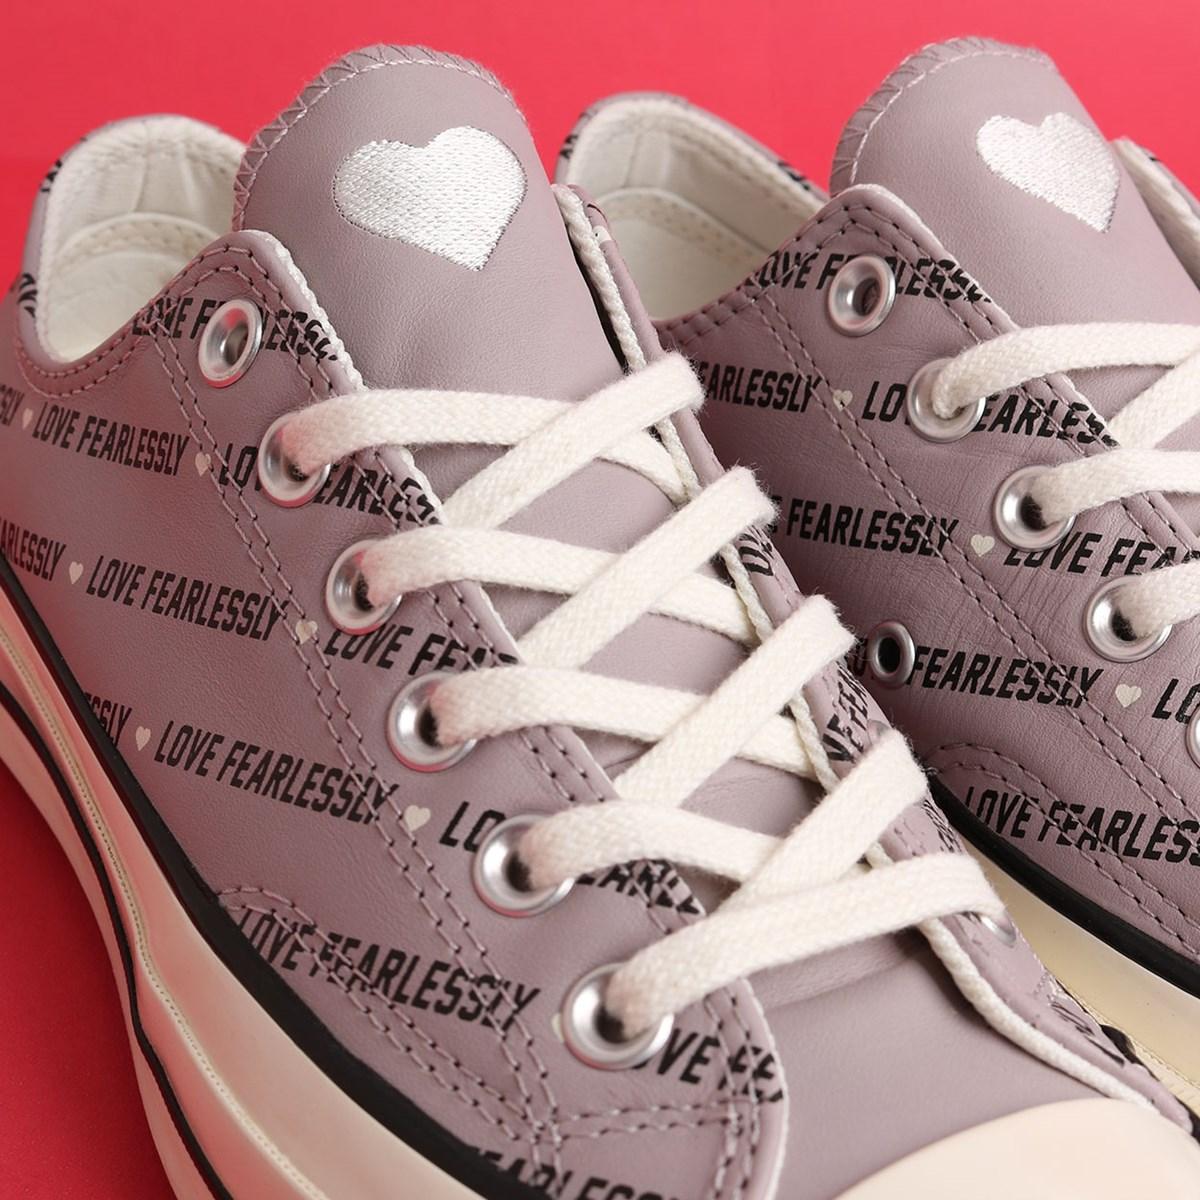 Tênis Converse Chuck 70 Love Fearlessly Ox Amethyst Grey Egret 567154C